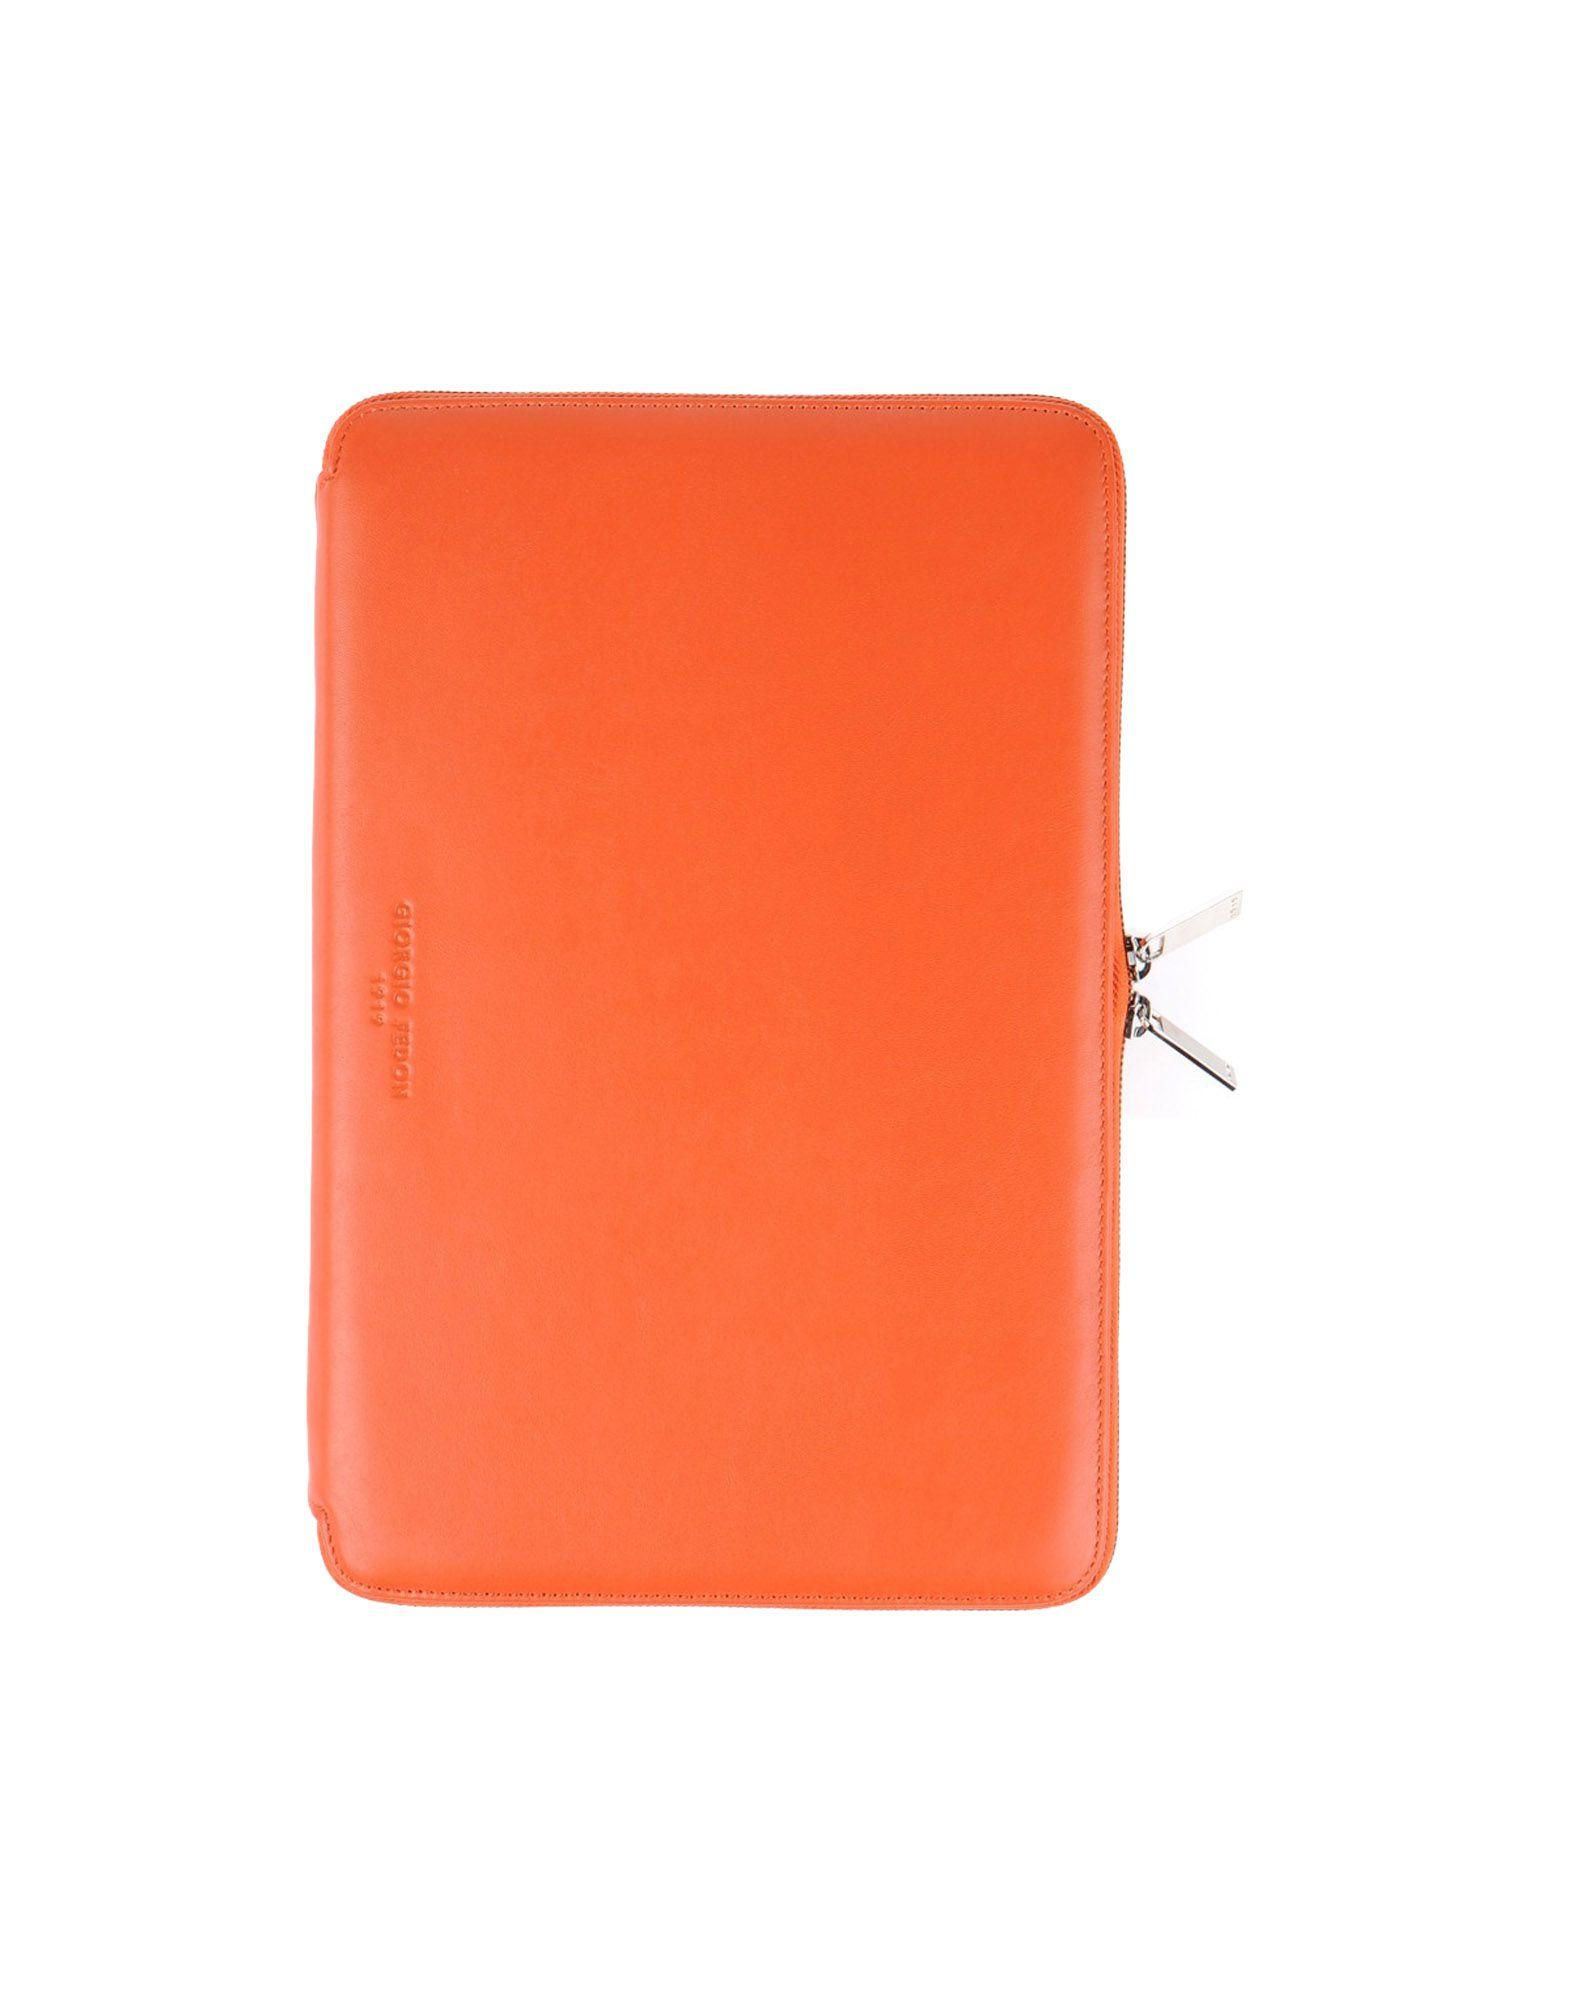 GIORGIO FEDON 1919 Деловые сумки new cpu cooling fan for hp hp elitebook 8560w 8570w laptop p n mf60150v1 c000 s9a